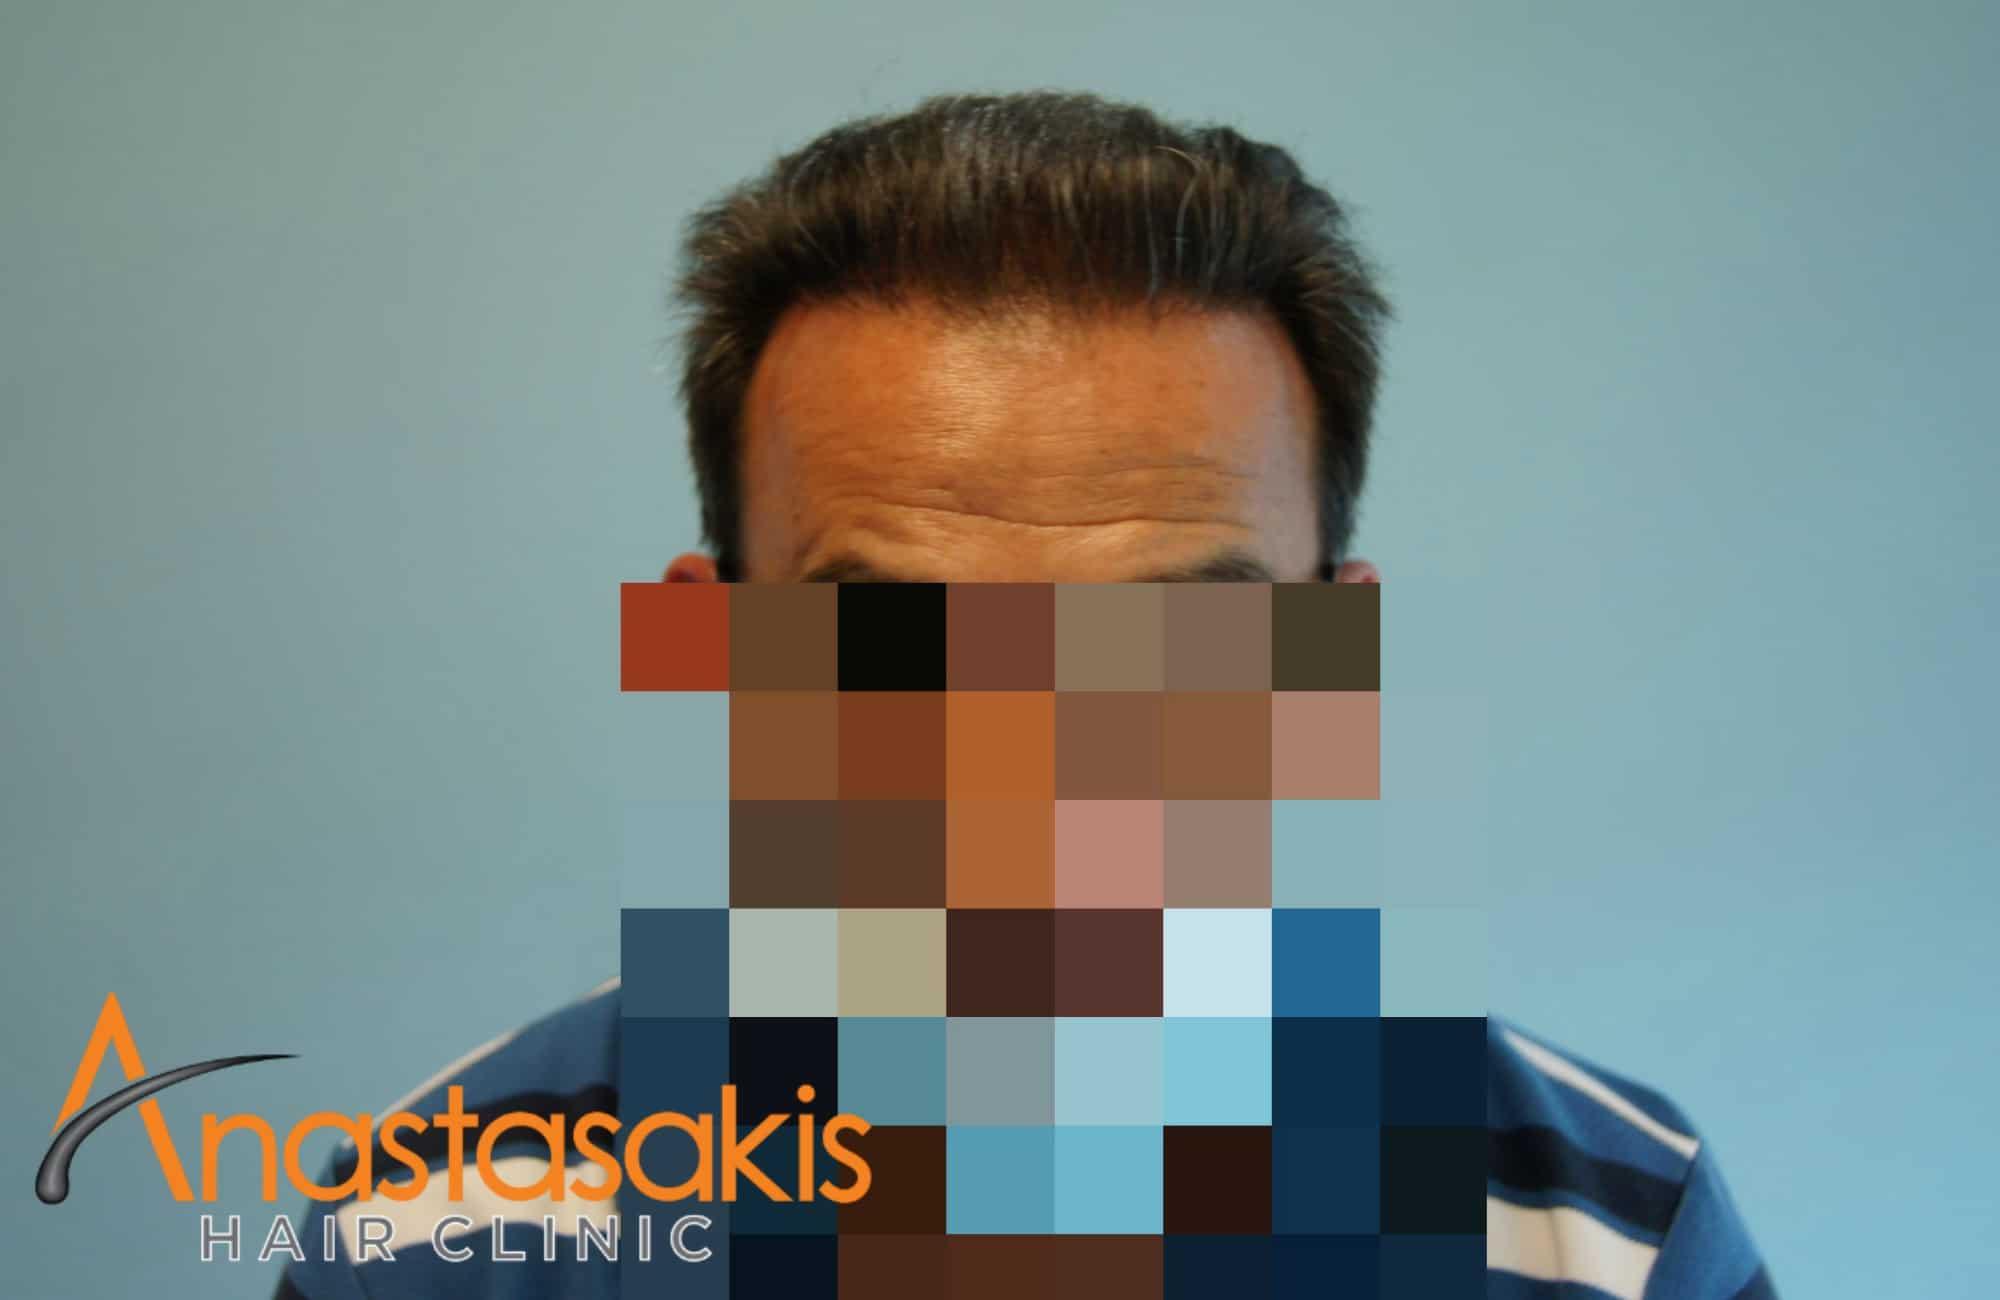 full face ασθενούς μετά τη μεταμοσχευση μαλλιων με 3500 fus με τη μεθοδο fut